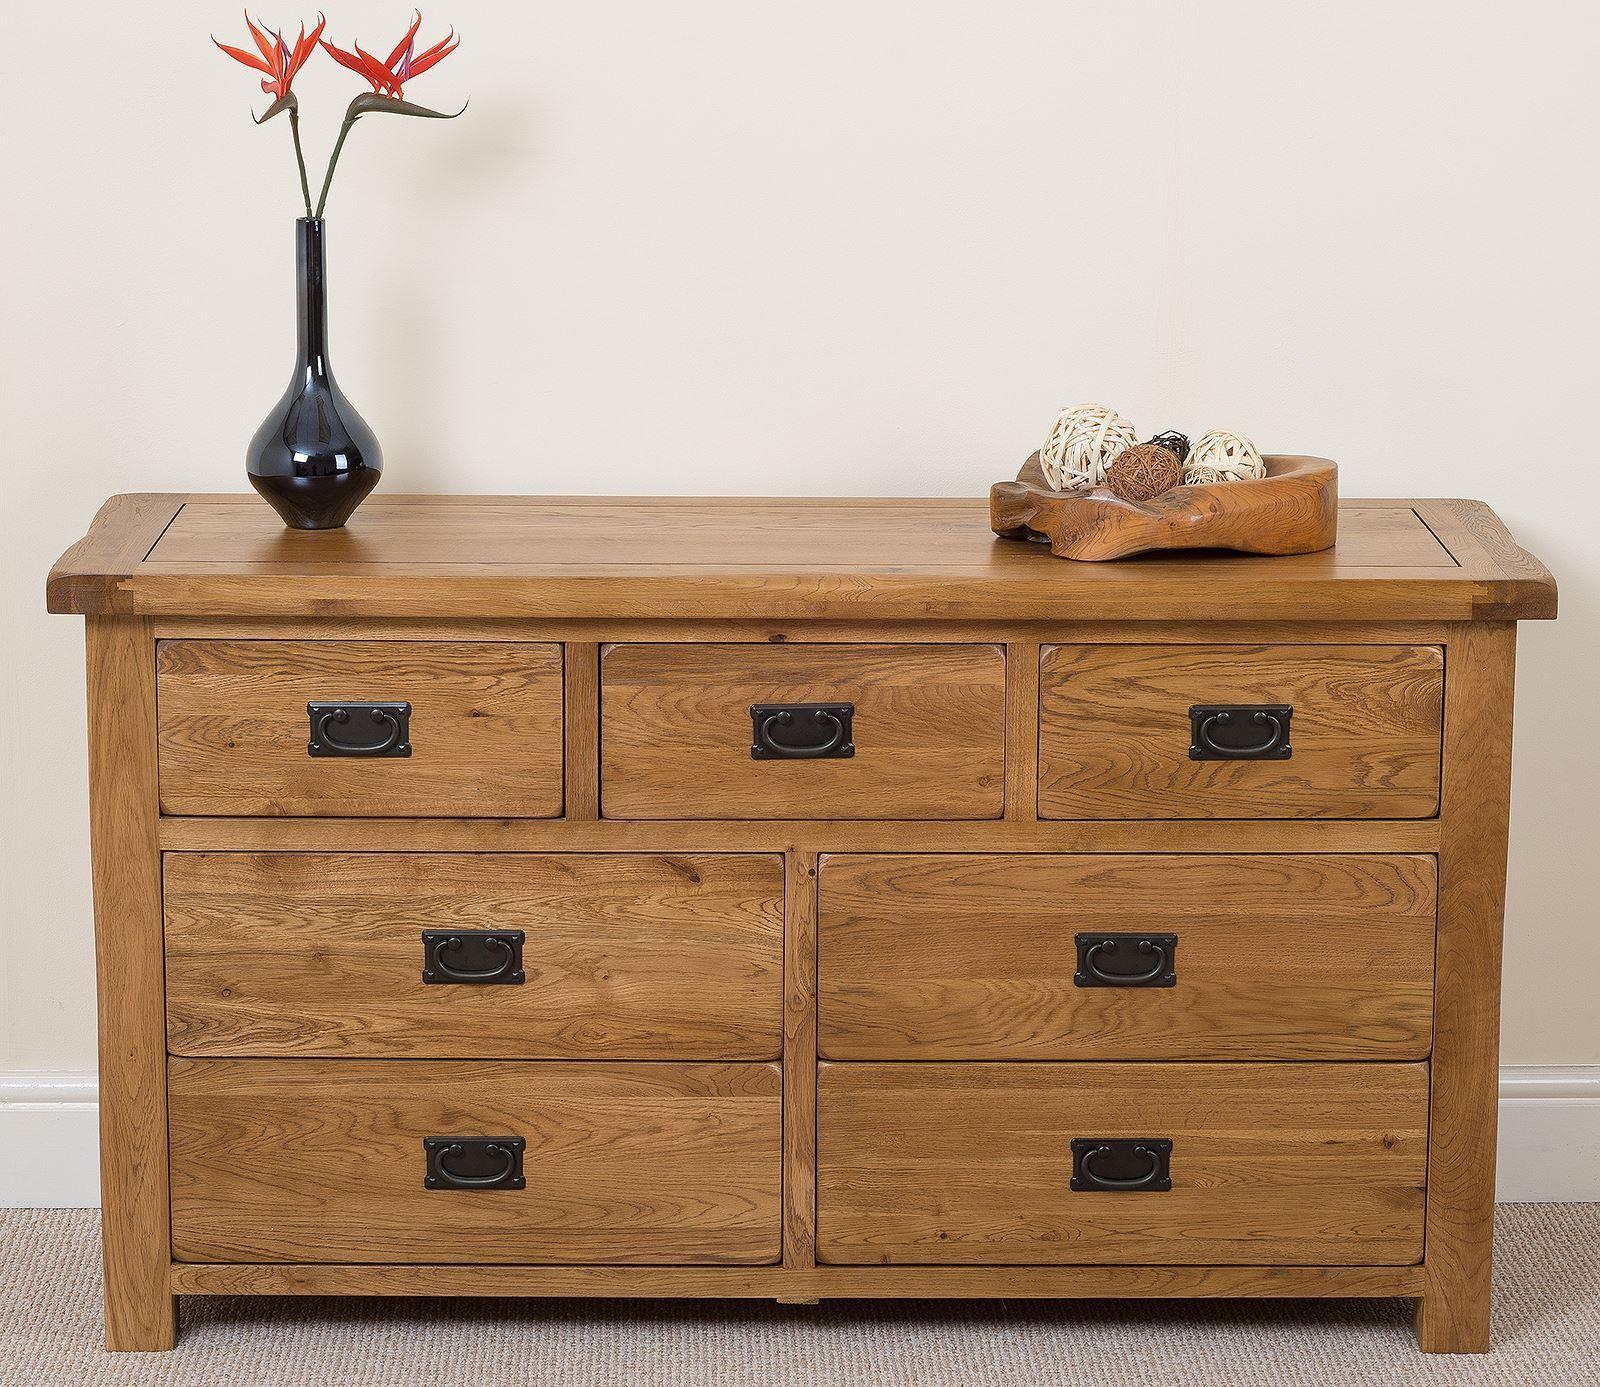 cotswold oak chest of drawers modern furniture direct. Black Bedroom Furniture Sets. Home Design Ideas